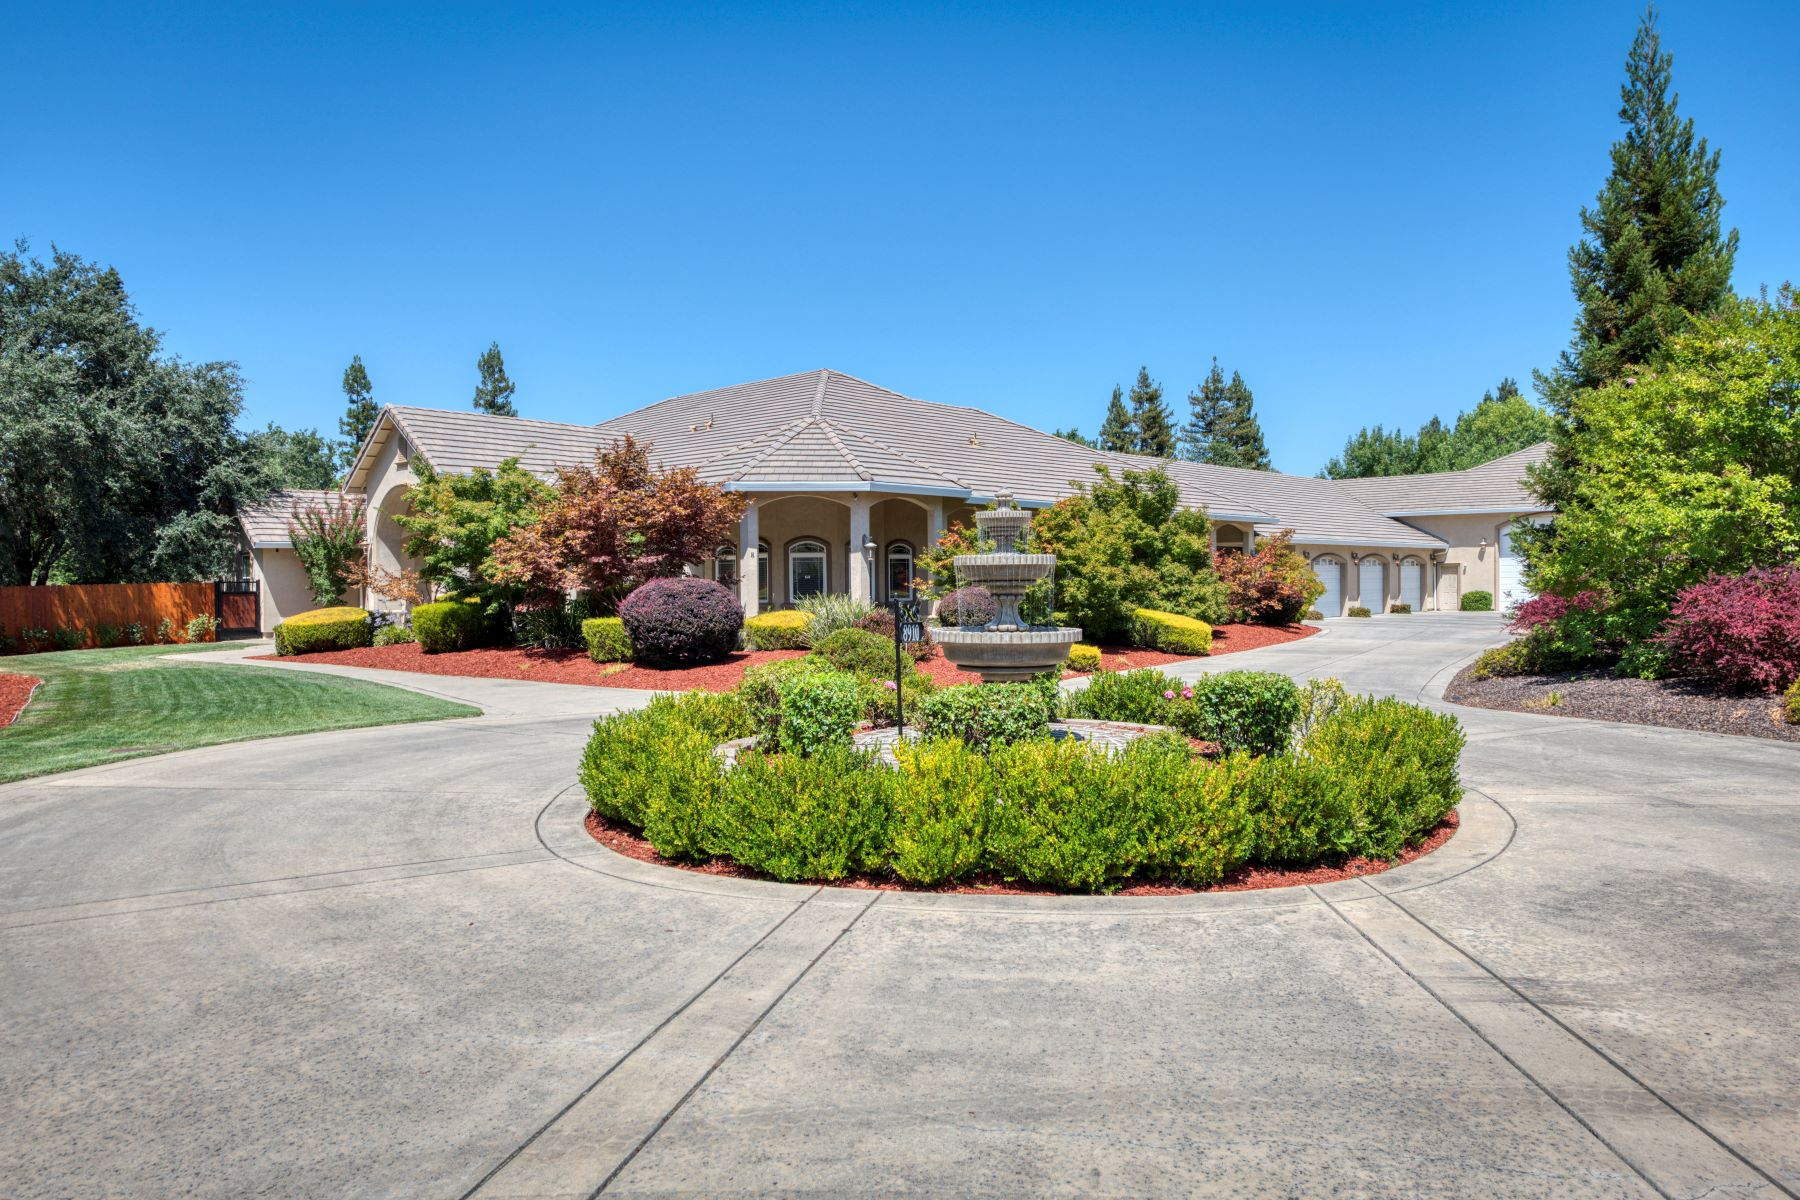 Single Family Homes 为 销售 在 8910 Little Creek Drive, Roseville, CA 95661 8910 Little Creek Drive Roseville, 加利福尼亚州 95661 美国